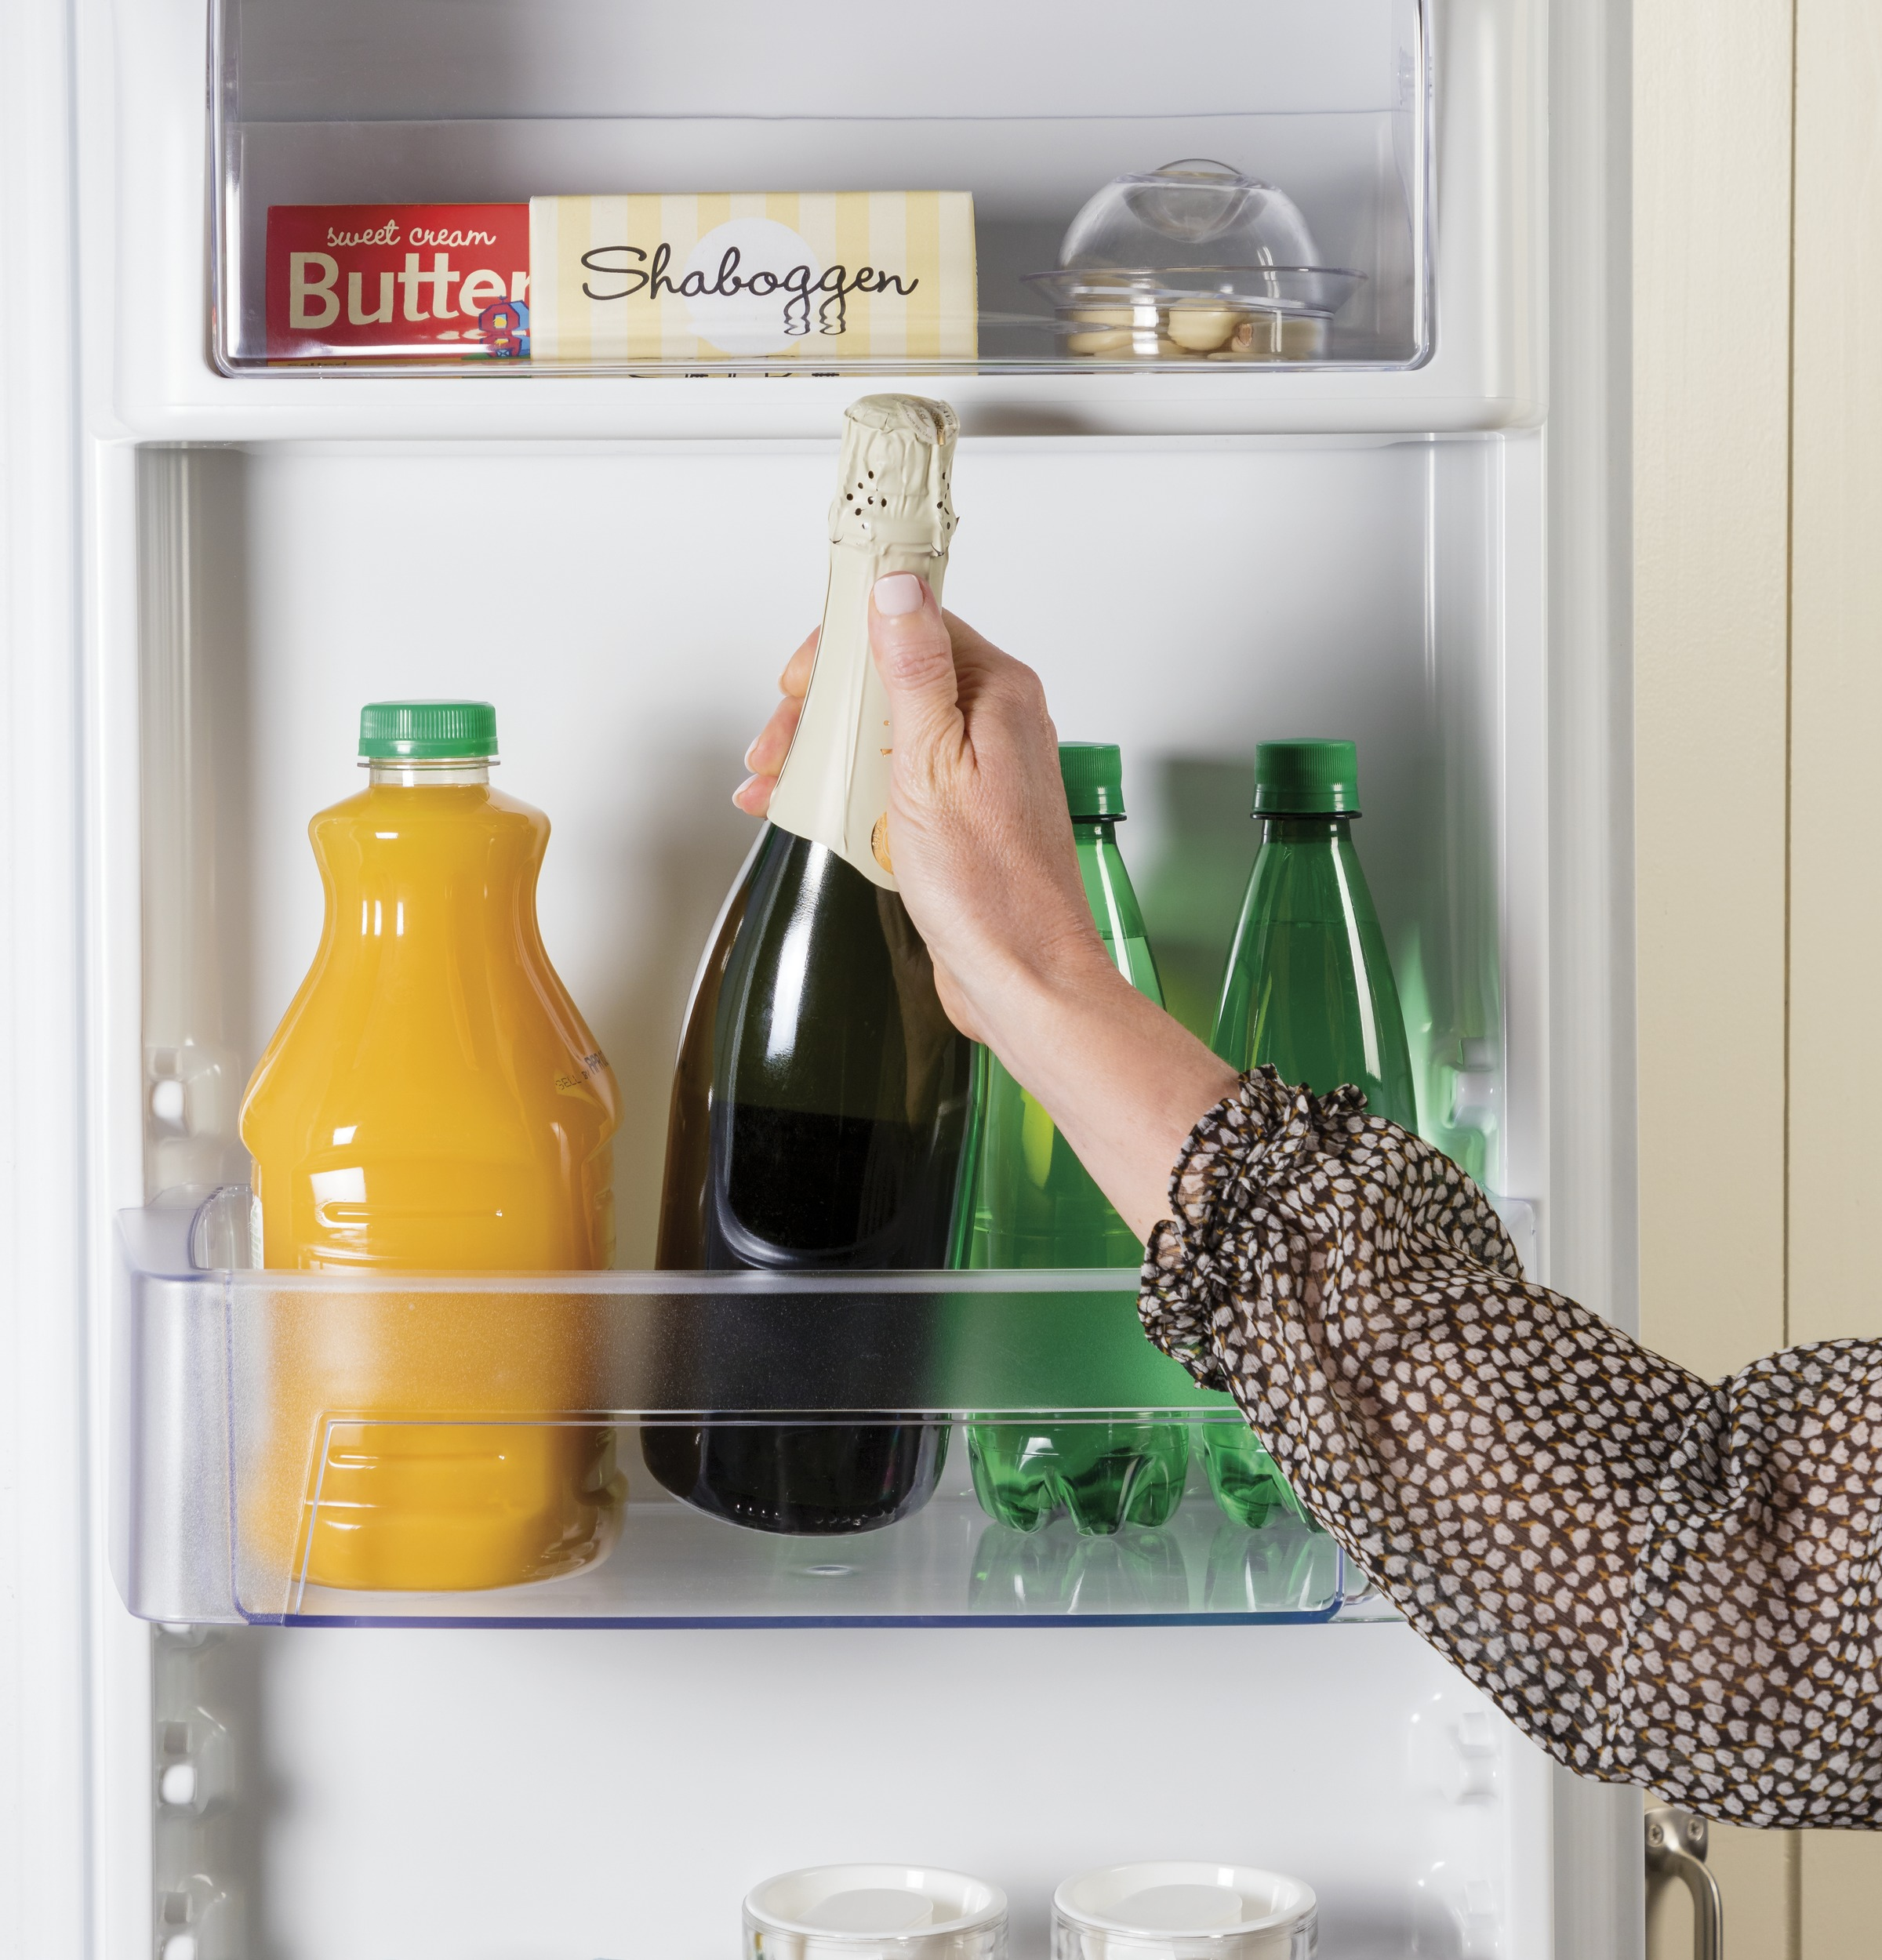 Model: GZS22IMNES | GE GE® 21.8 Cu. Ft. Counter-Depth Side-By-Side Refrigerator